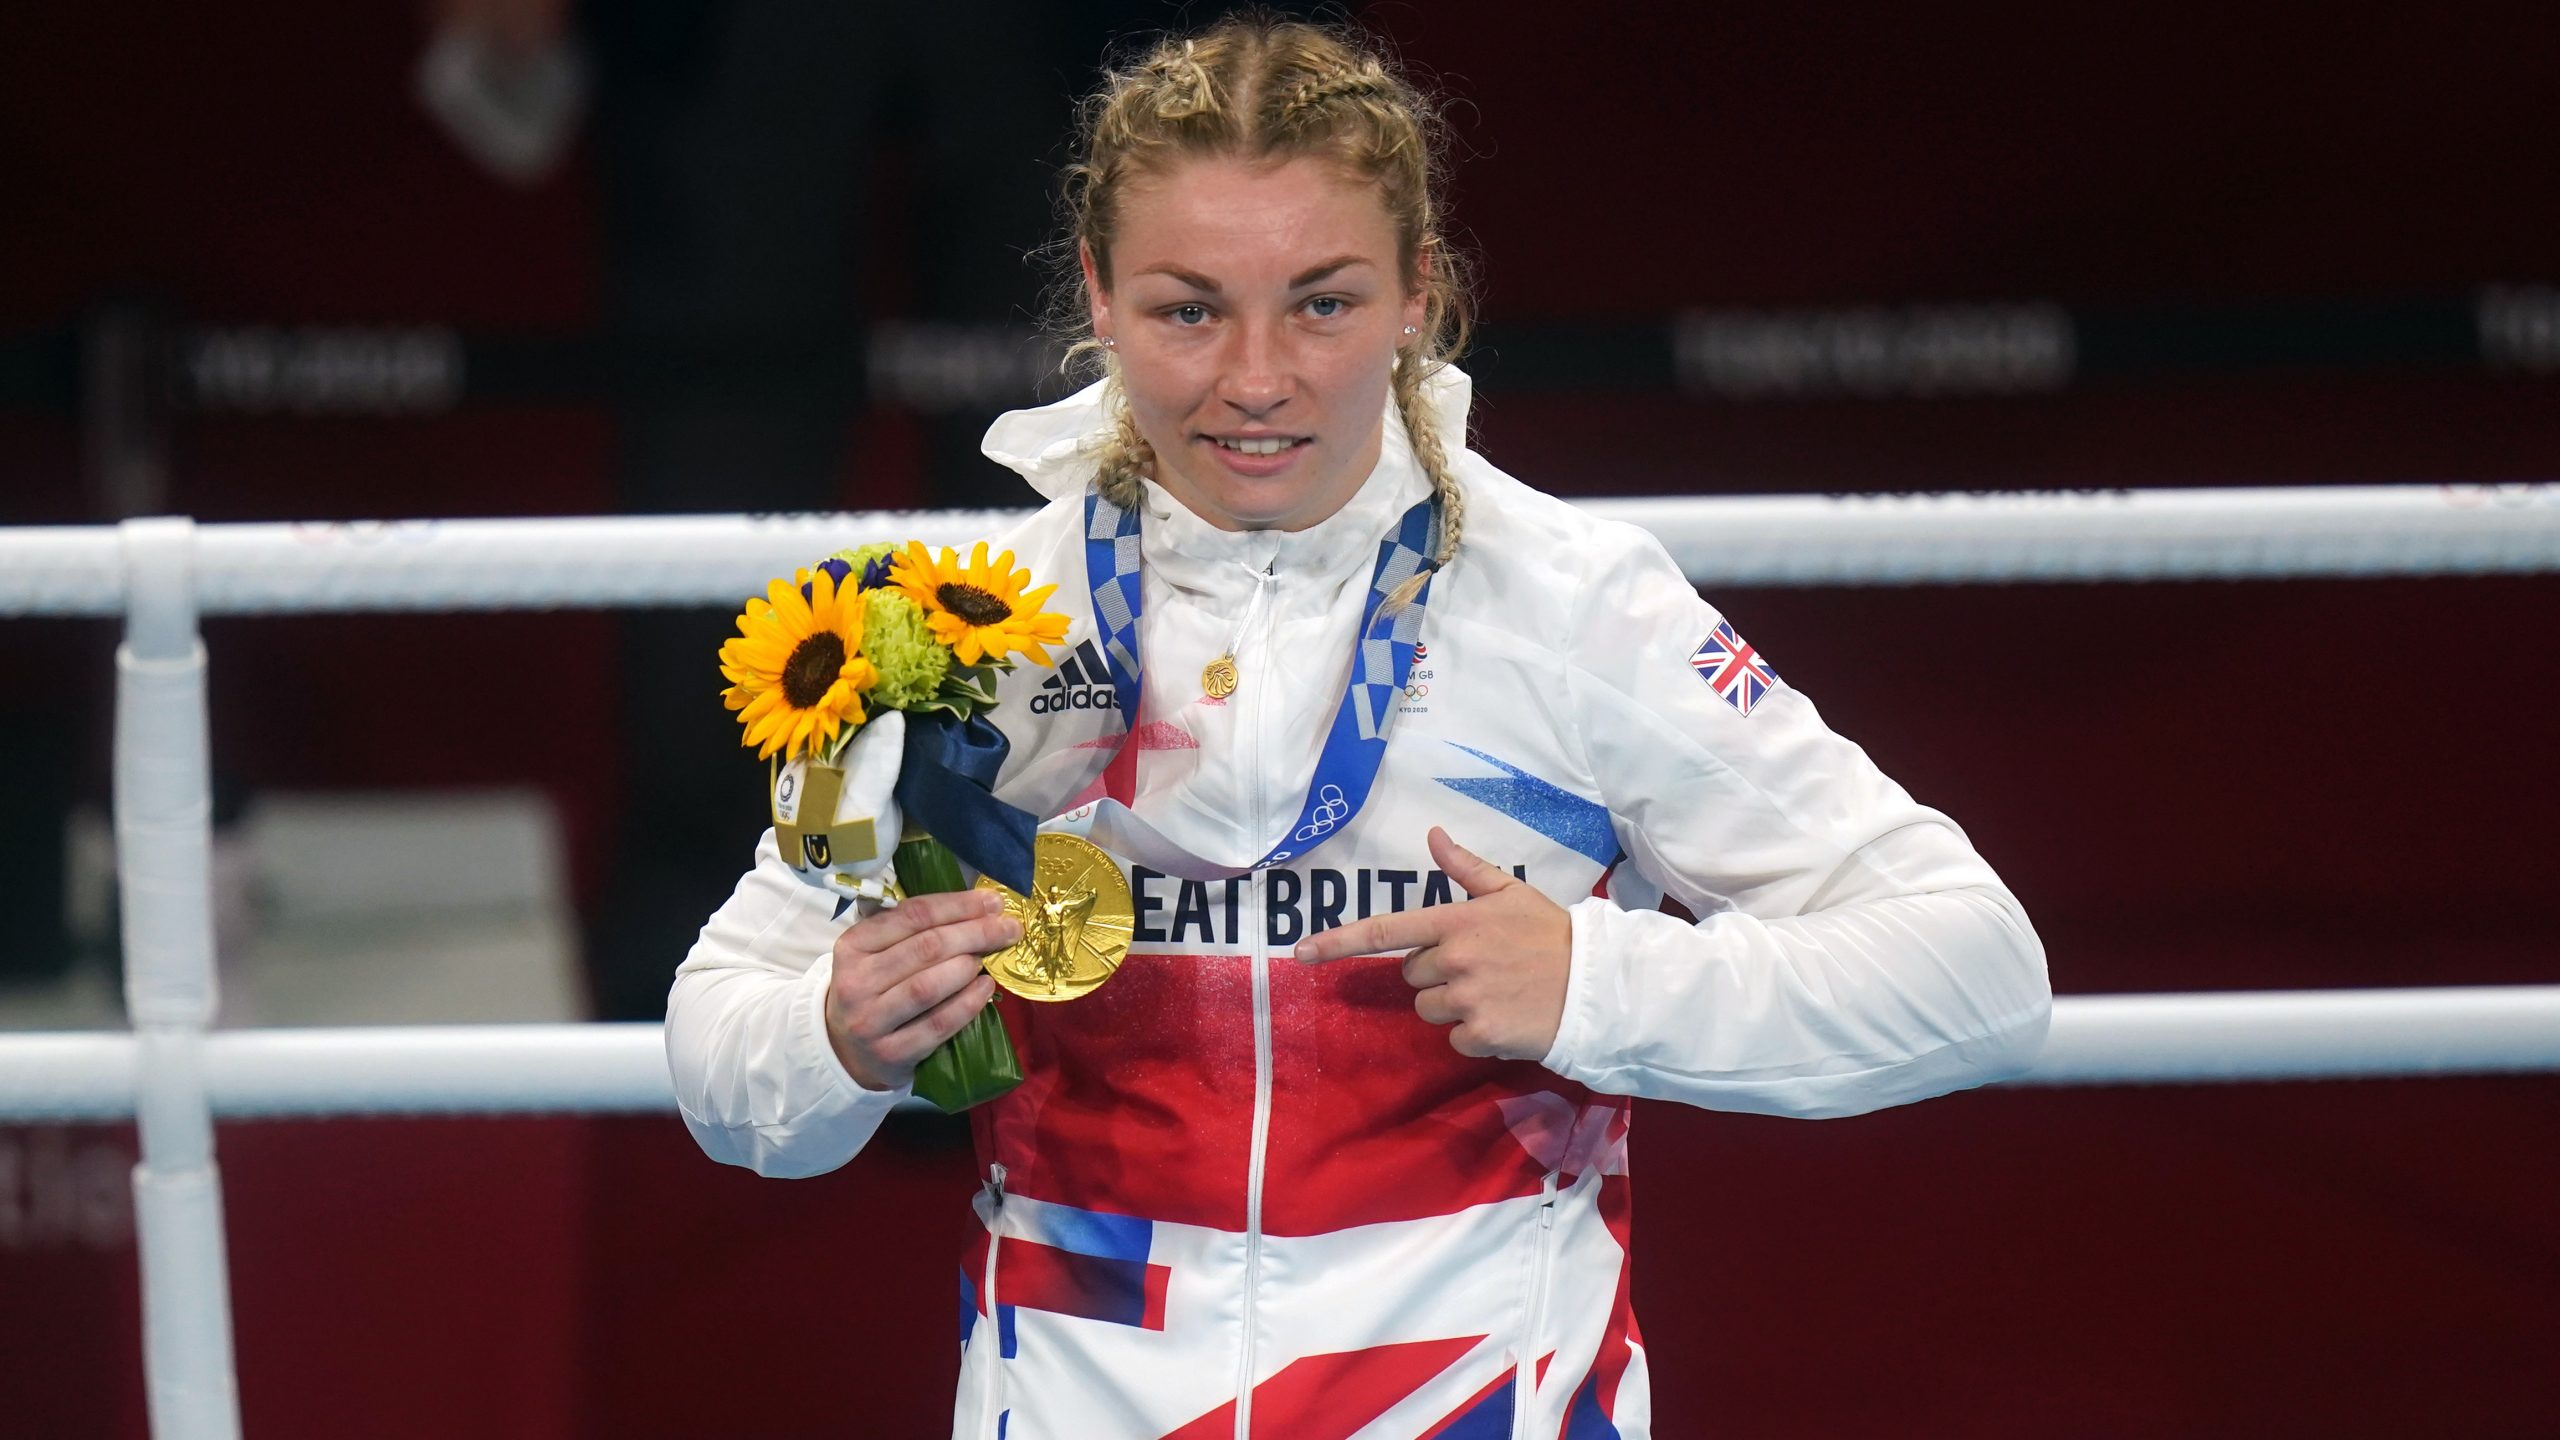 Tokyo 2020: Team GB's Lauren Price wins boxing gold in women's middleweight final   ITV News